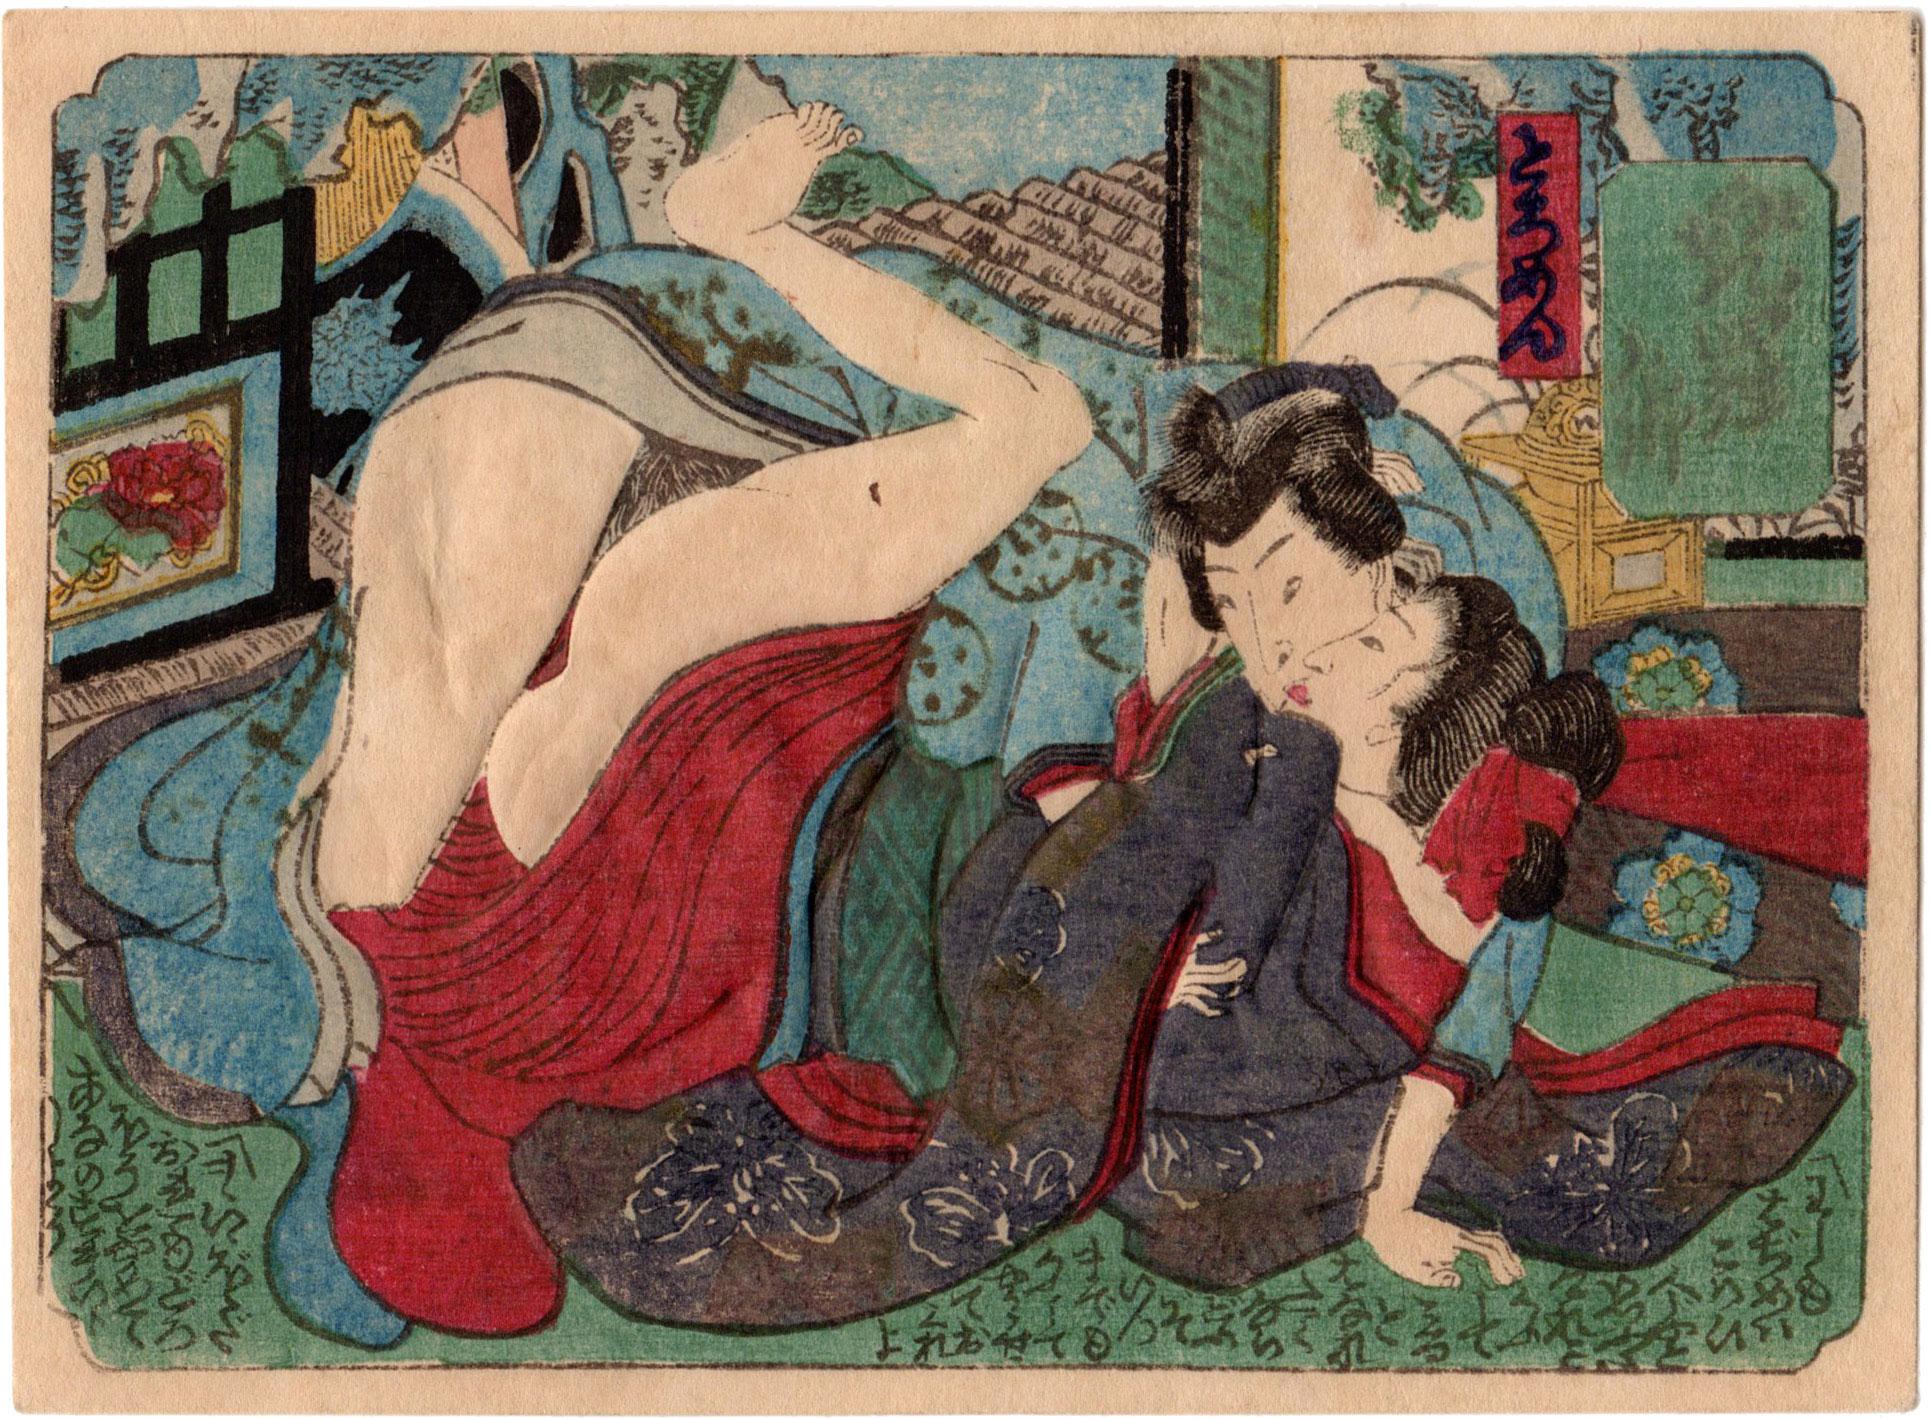 BROCADE PICTURE 09 (Utagawa School)